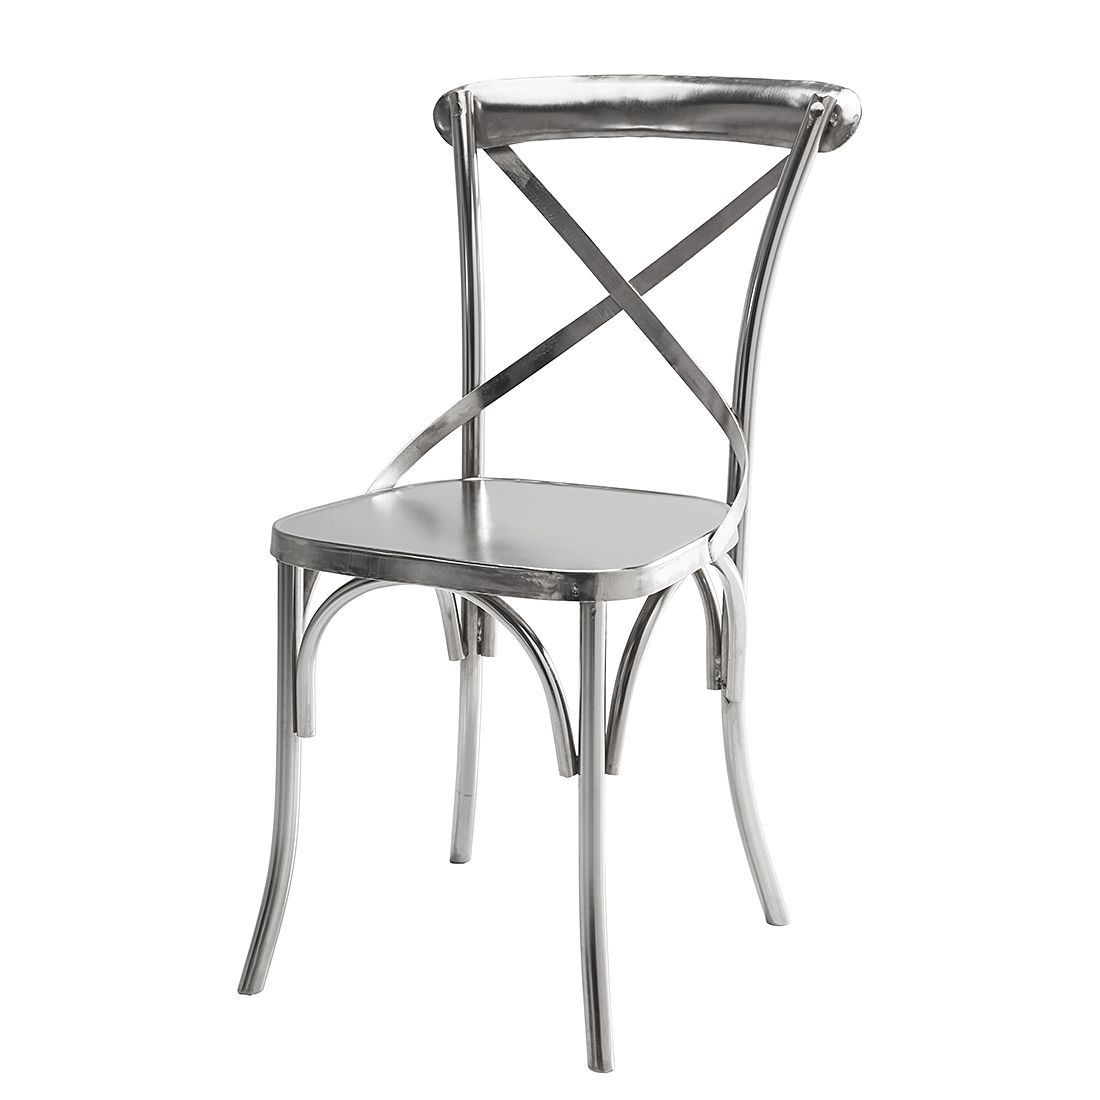 Bistrostuhl Castillo (2er-Set) - Eisen - Silber, Kare Design